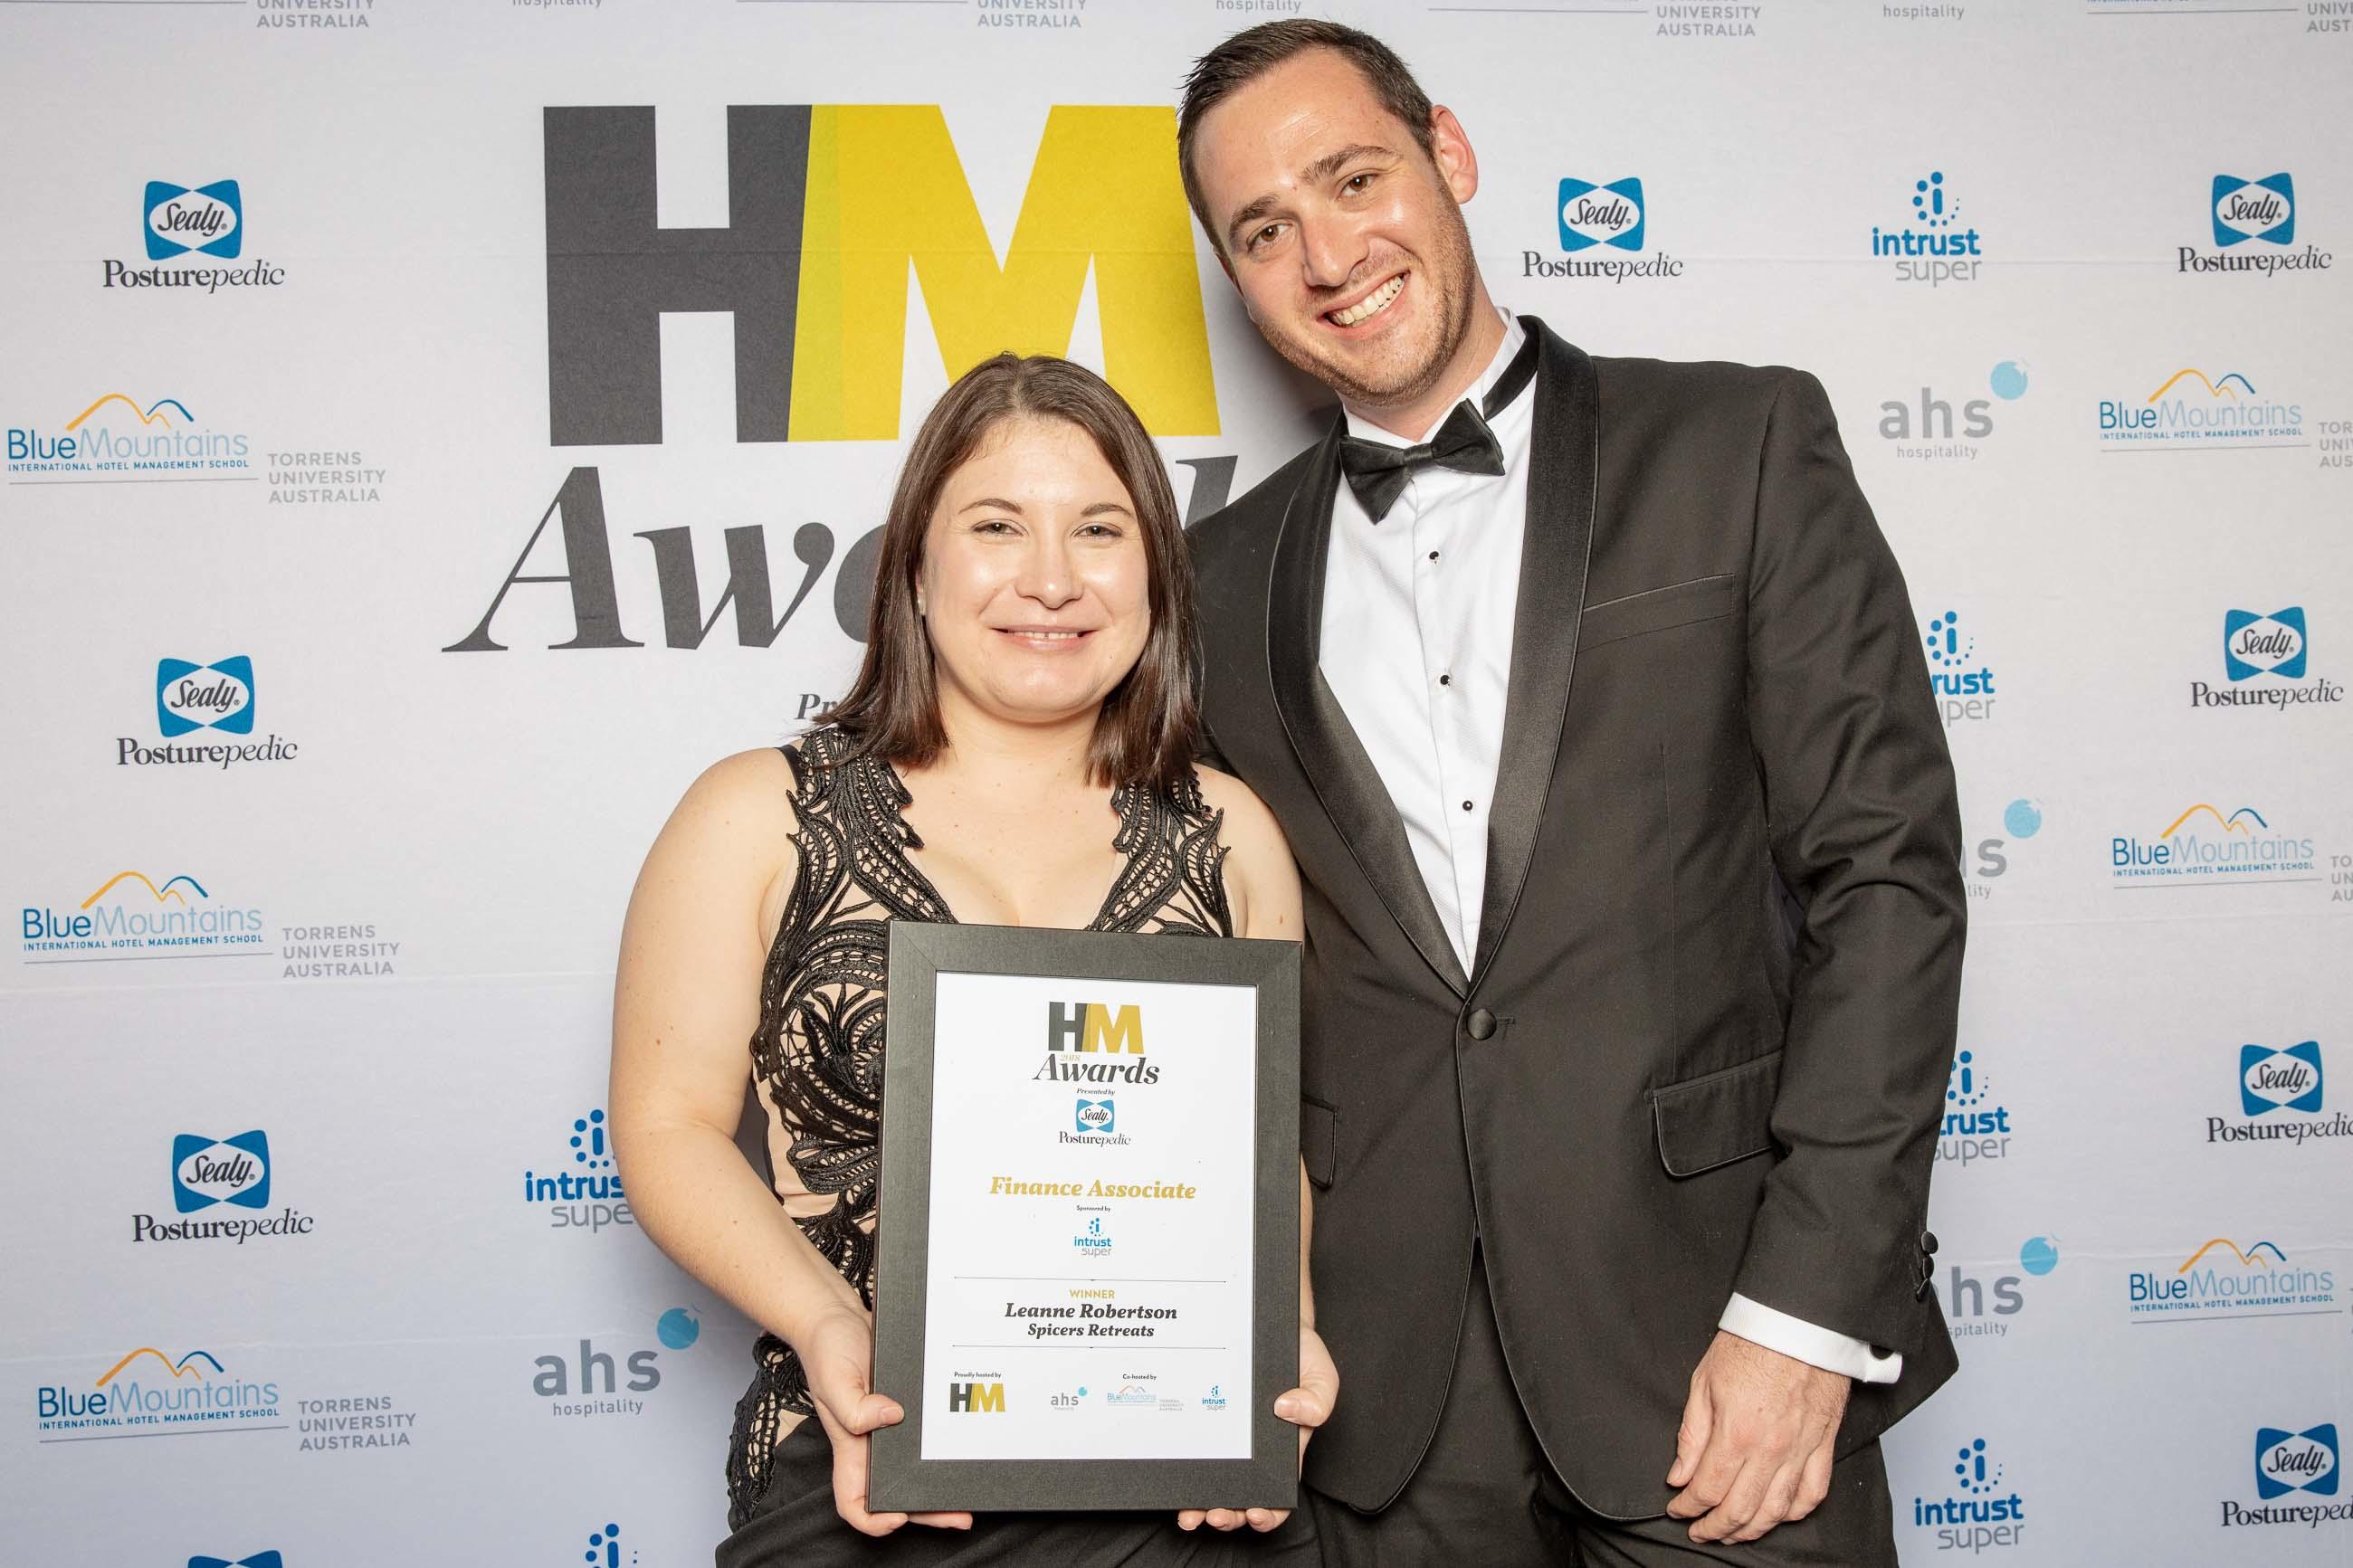 72ppi-HMawards-2018-official-award-wall-212212